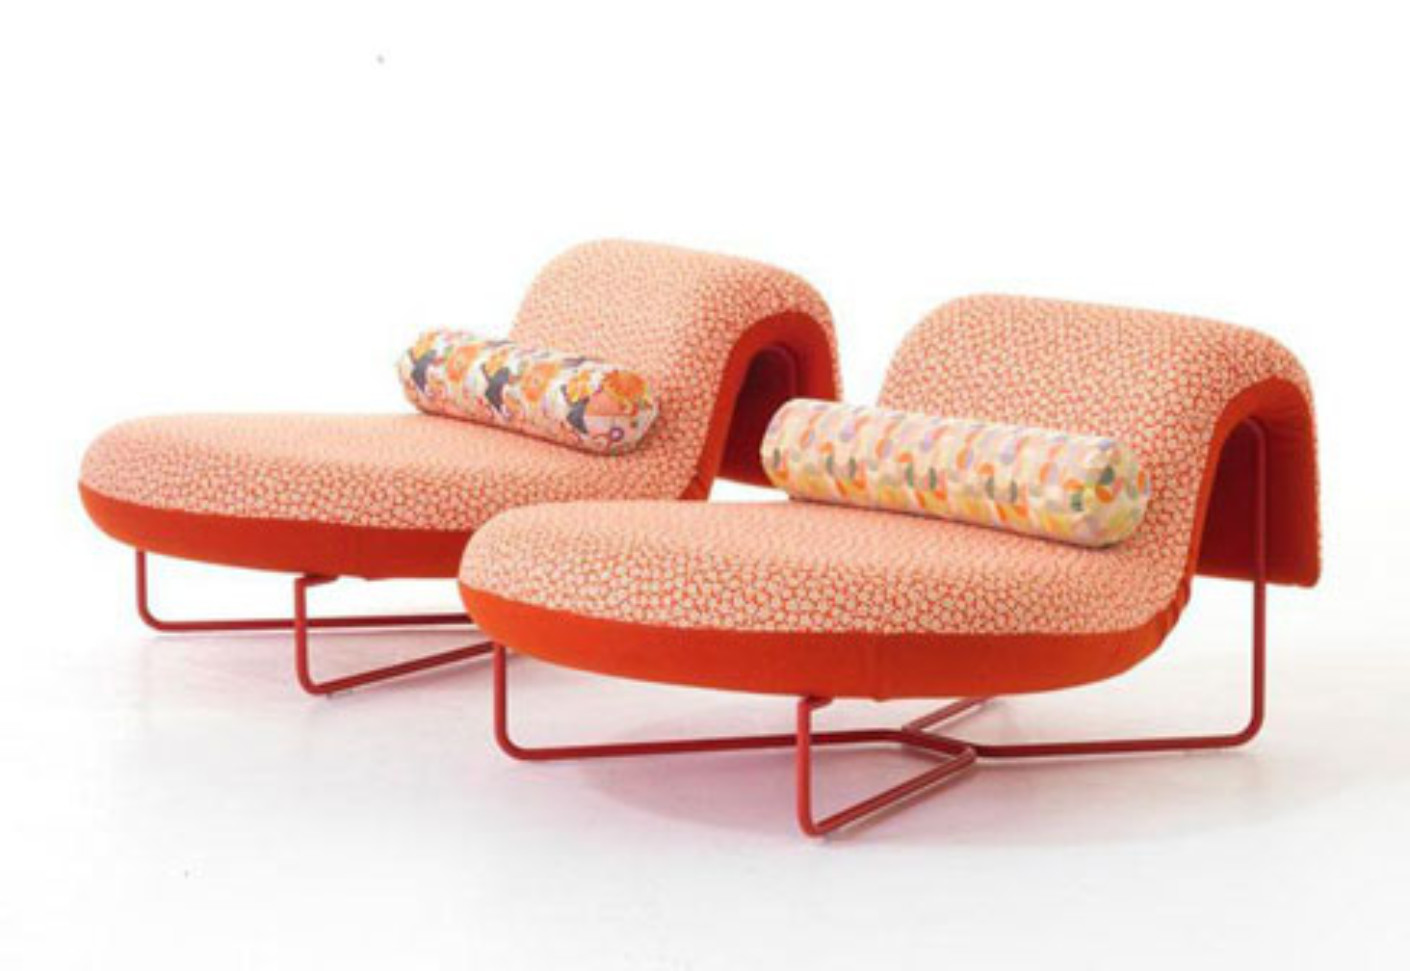 chairs bestreviews futon best chair june